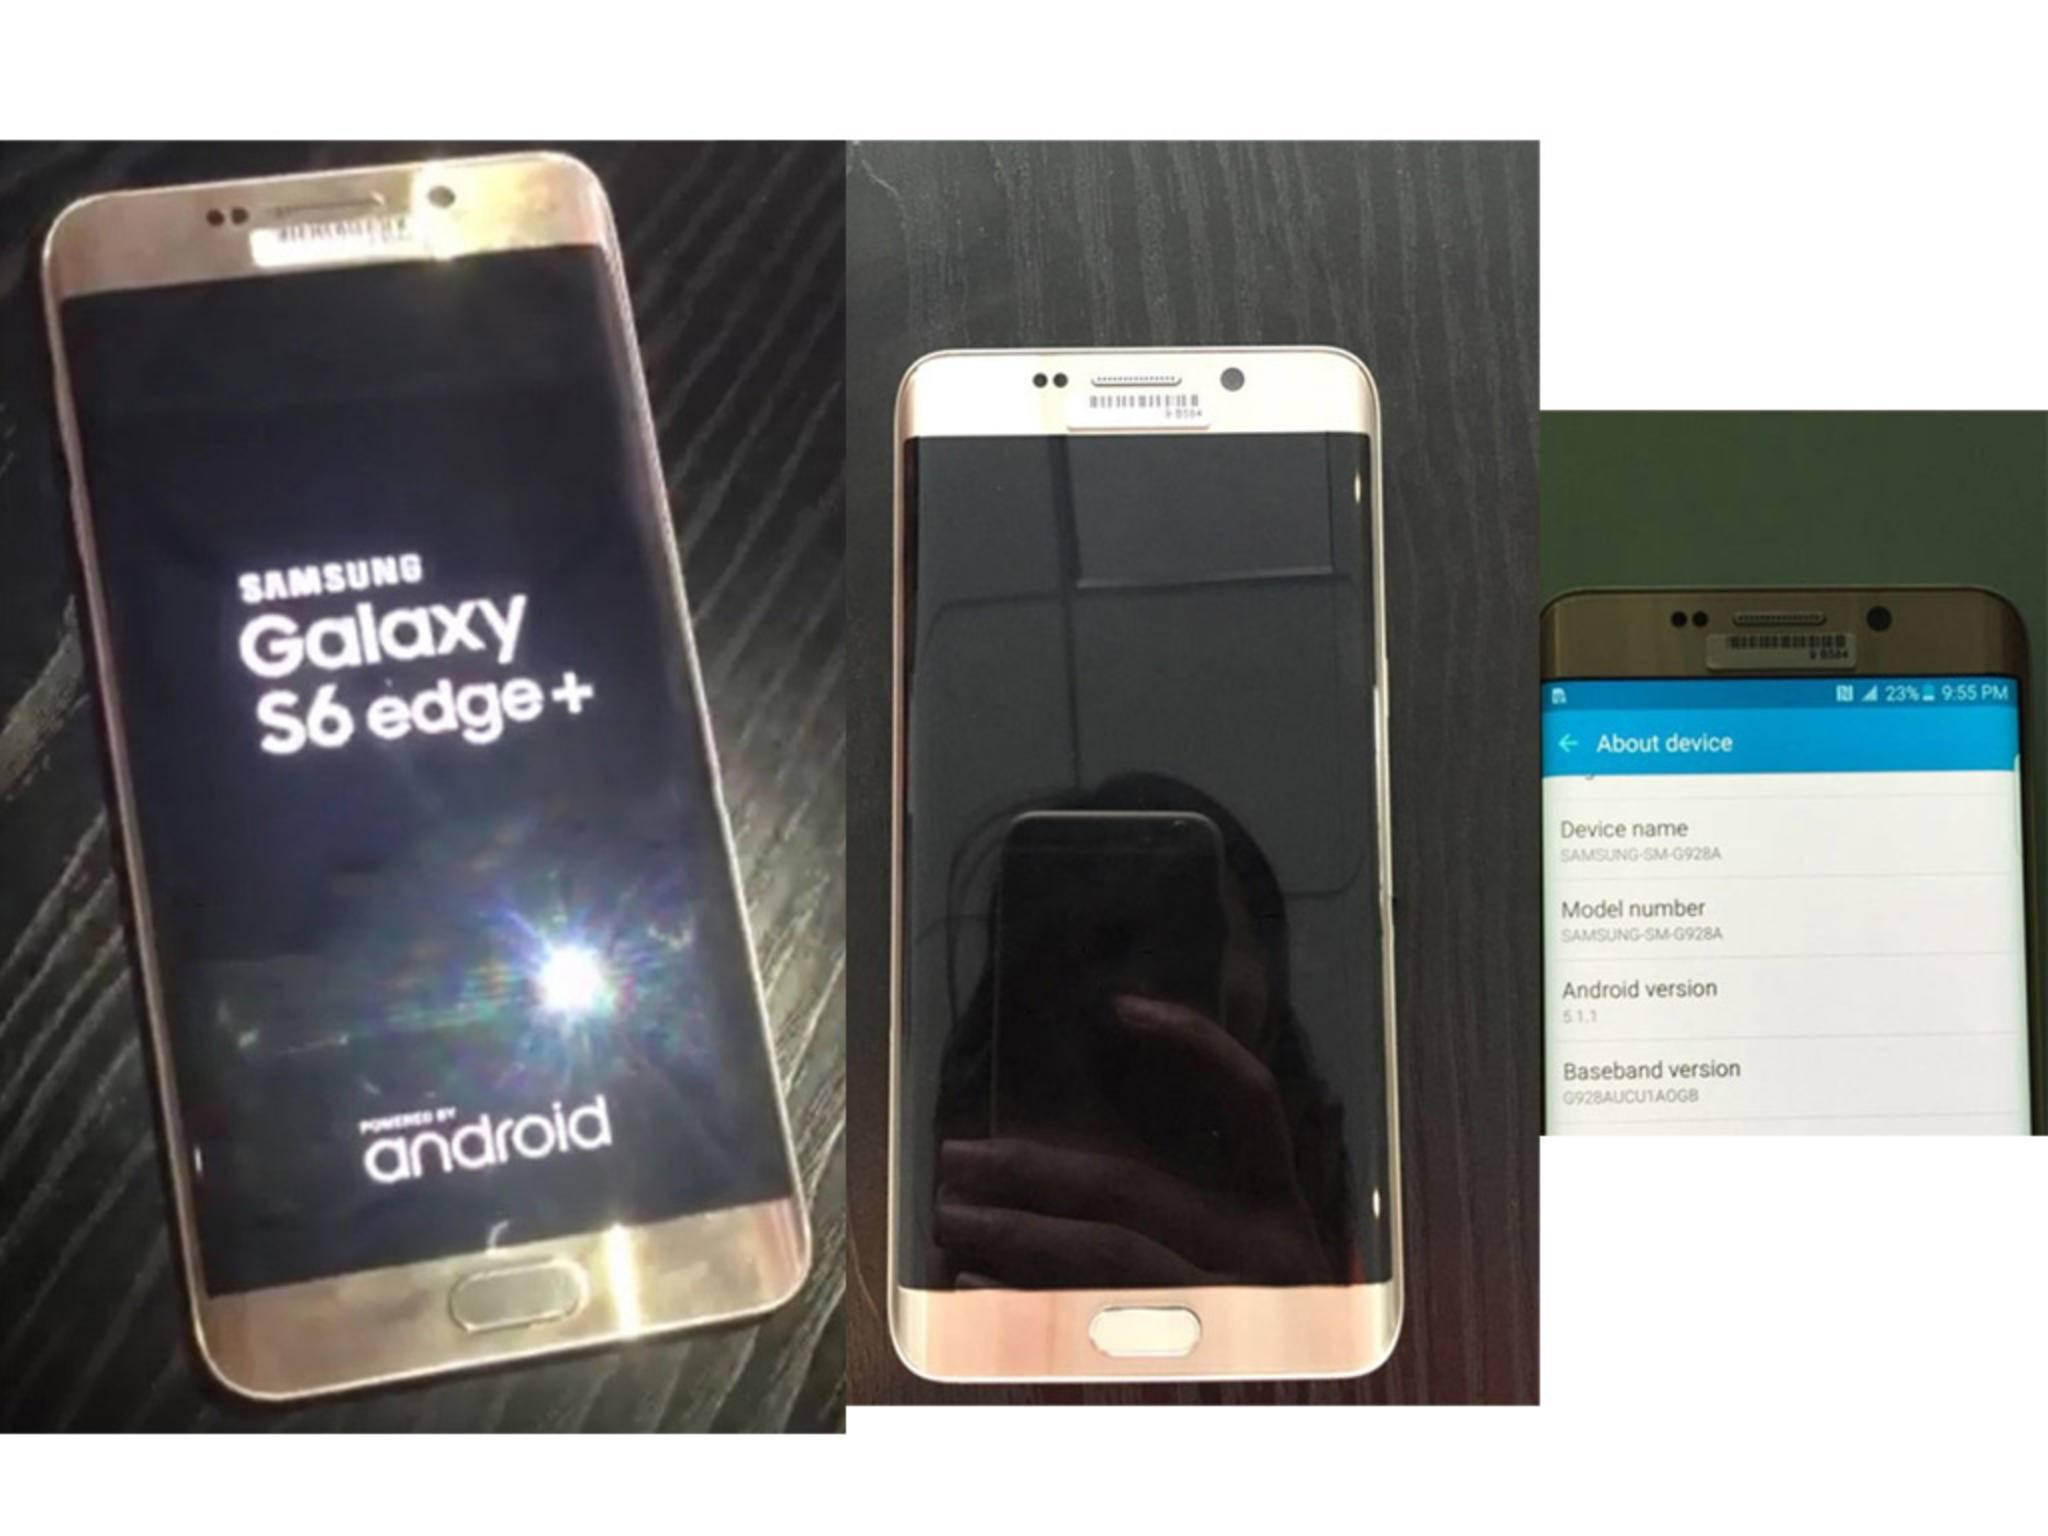 Samsung S6 Edge+ Leak